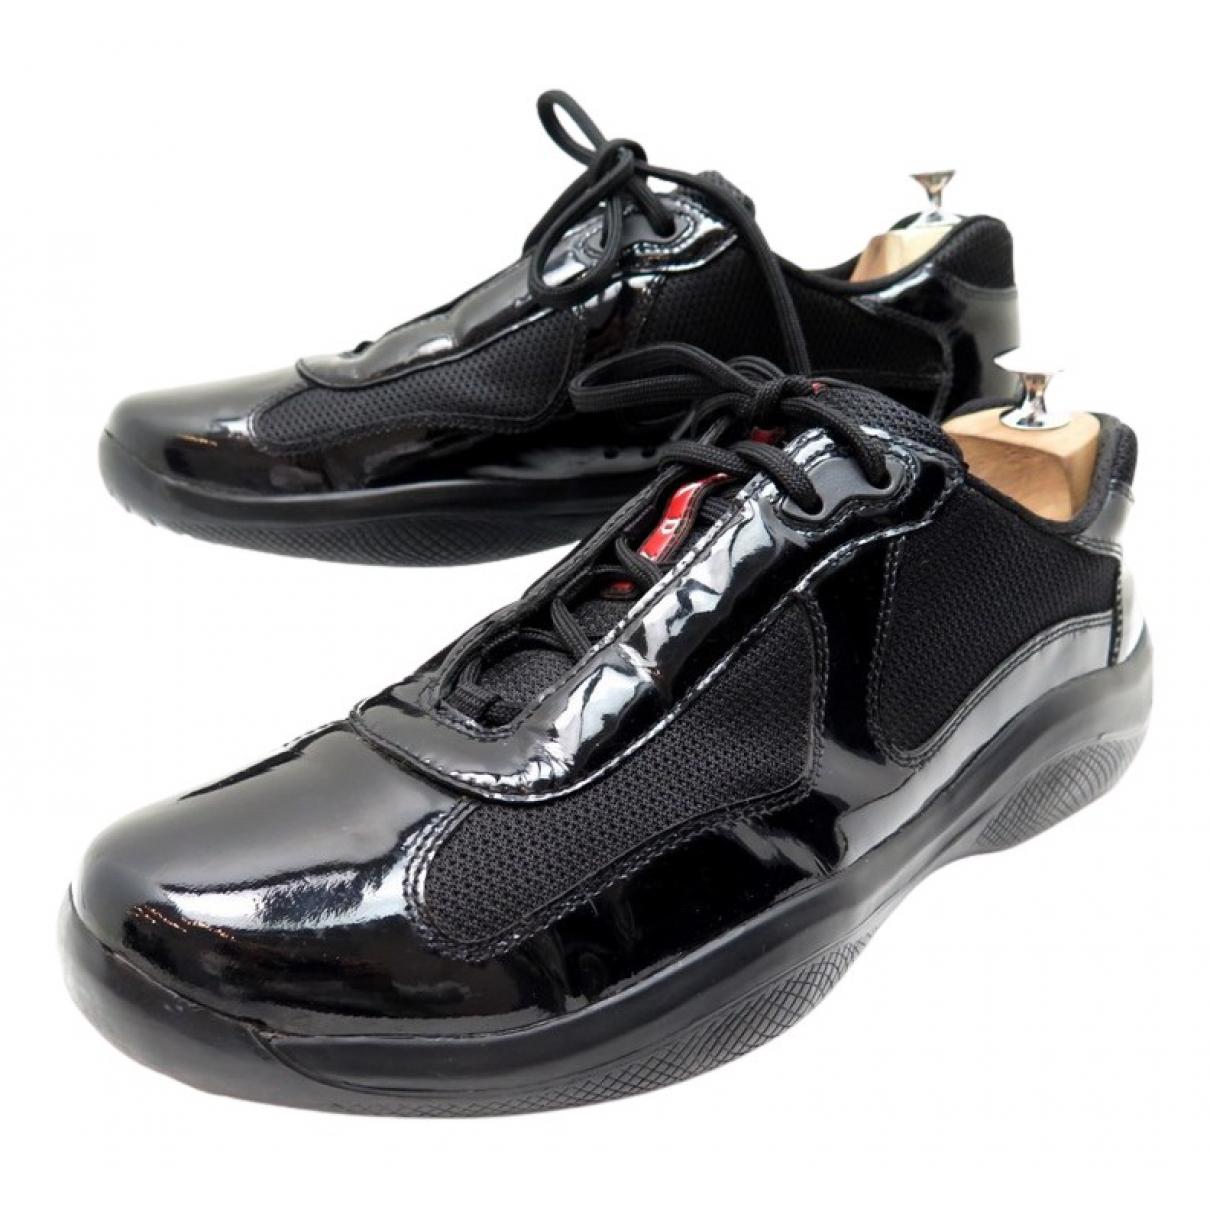 Prada N Black Patent leather Trainers for Men 44 EU